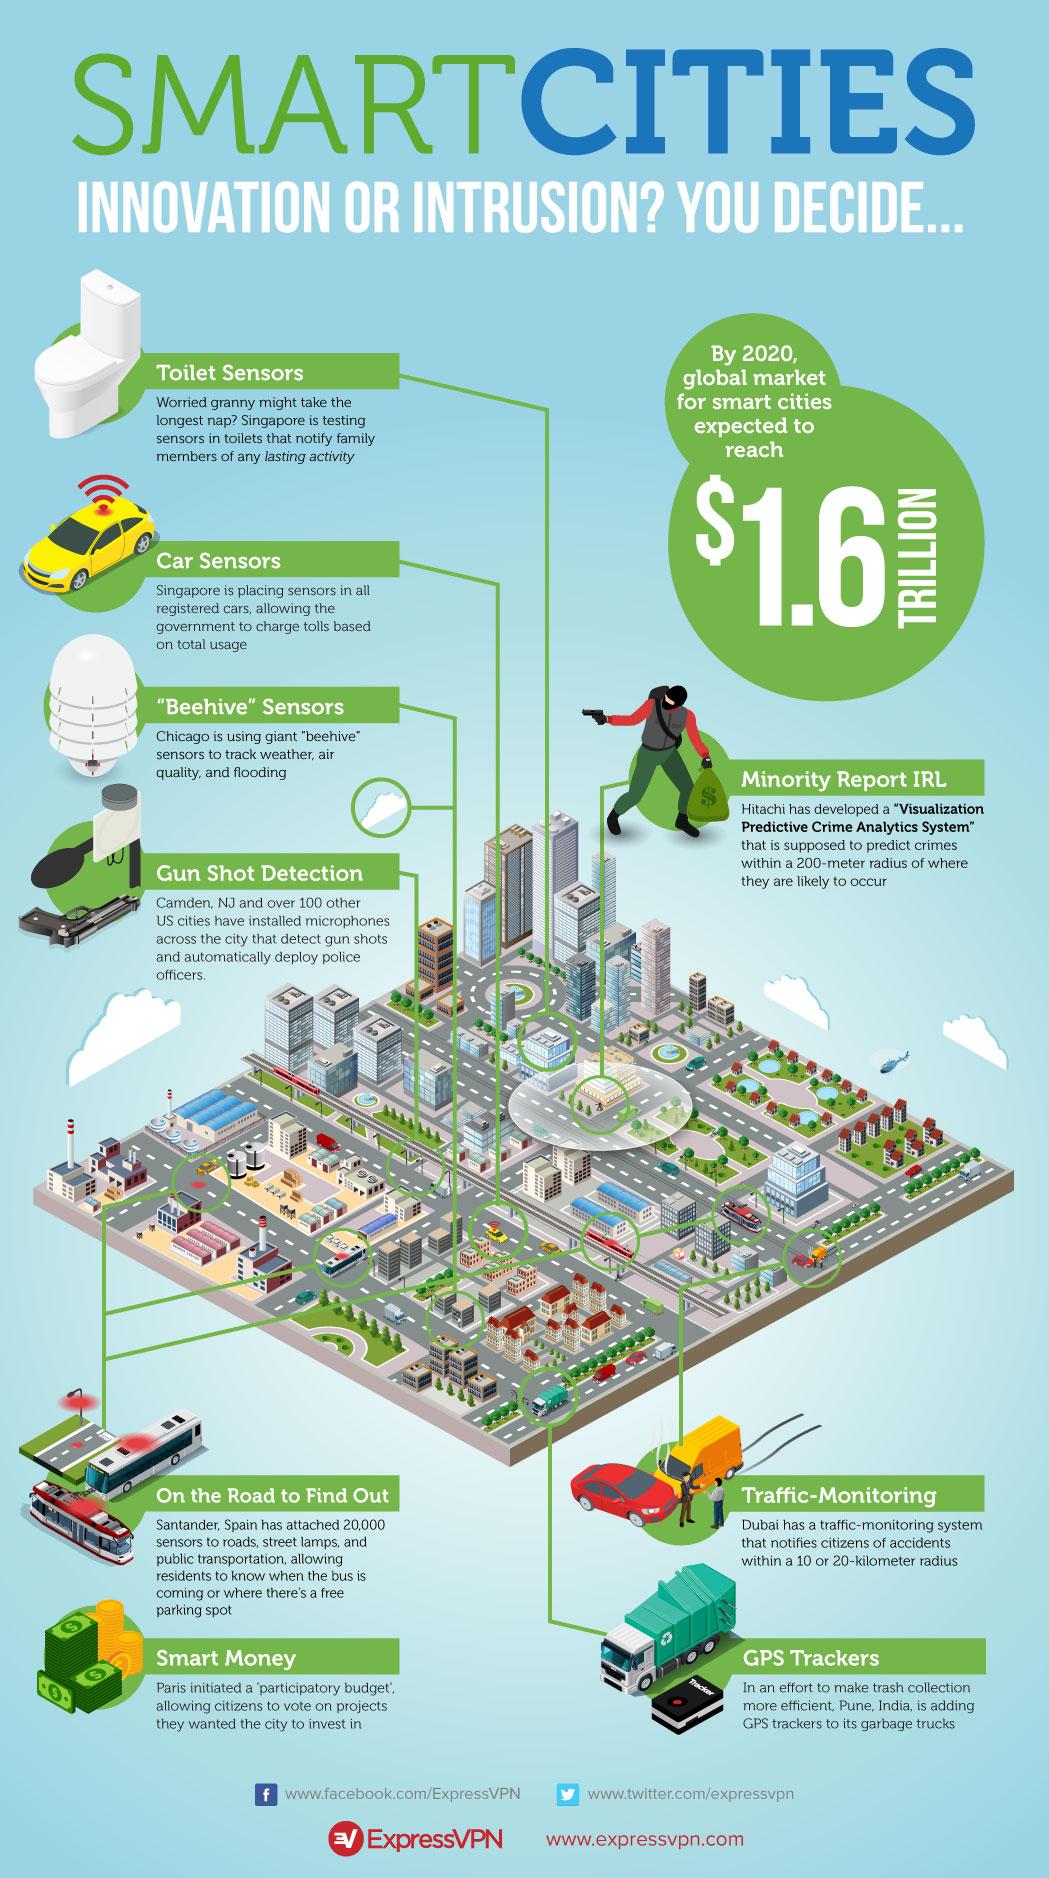 Smart Cities Innovation: Utopian dream or dystopian nightmare?